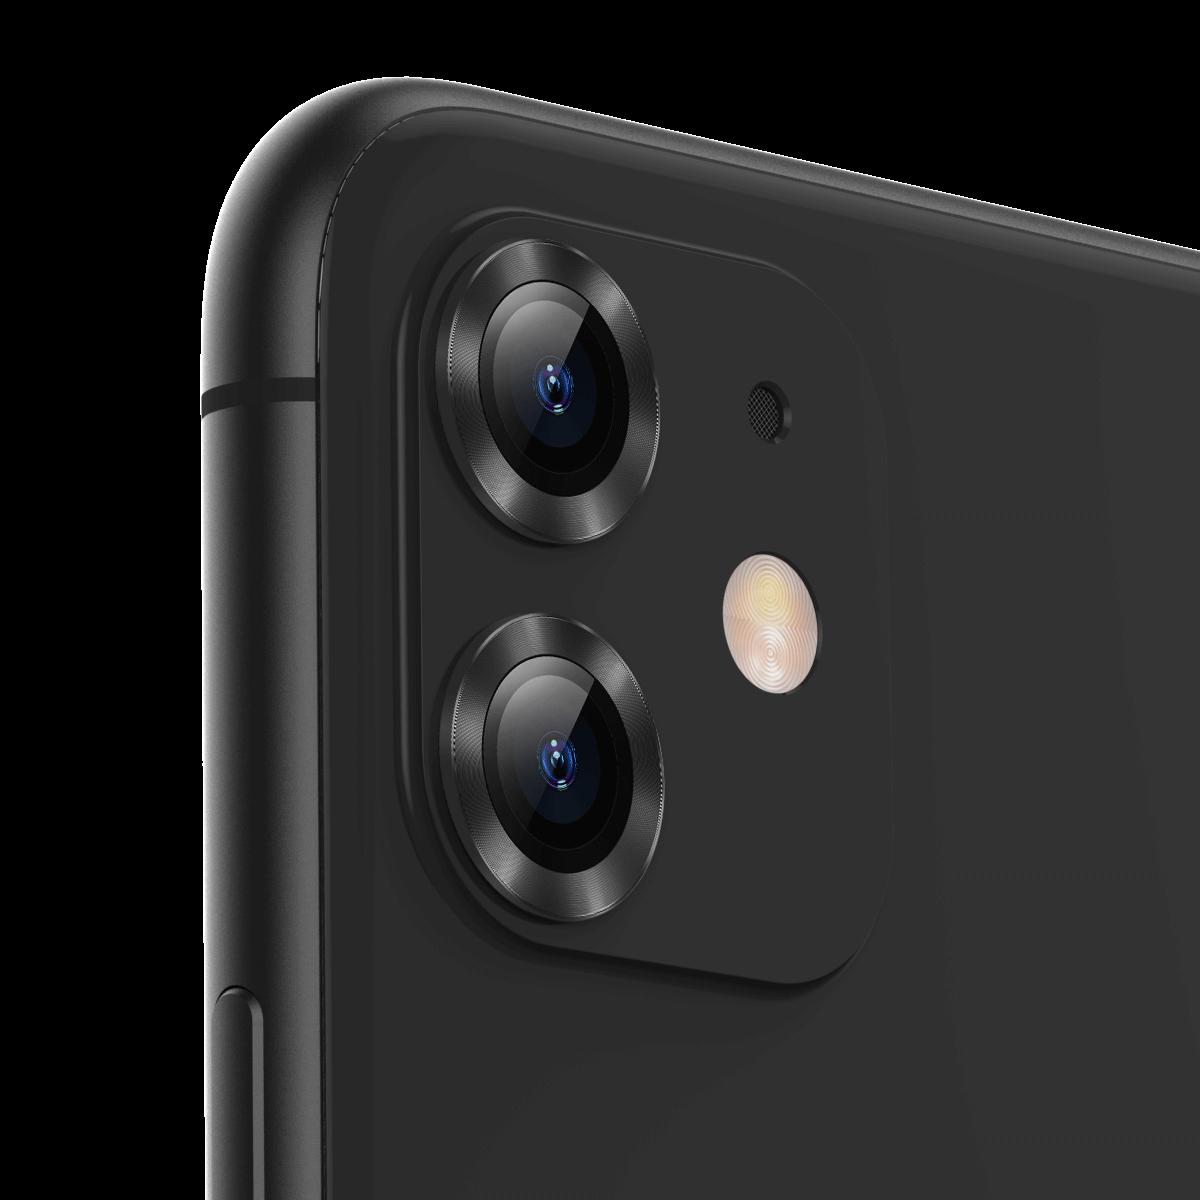 Baseus 2 i 1 Herdet + metall sirkelring Anti-rip telefonlinsebeskytter for iPhone 11